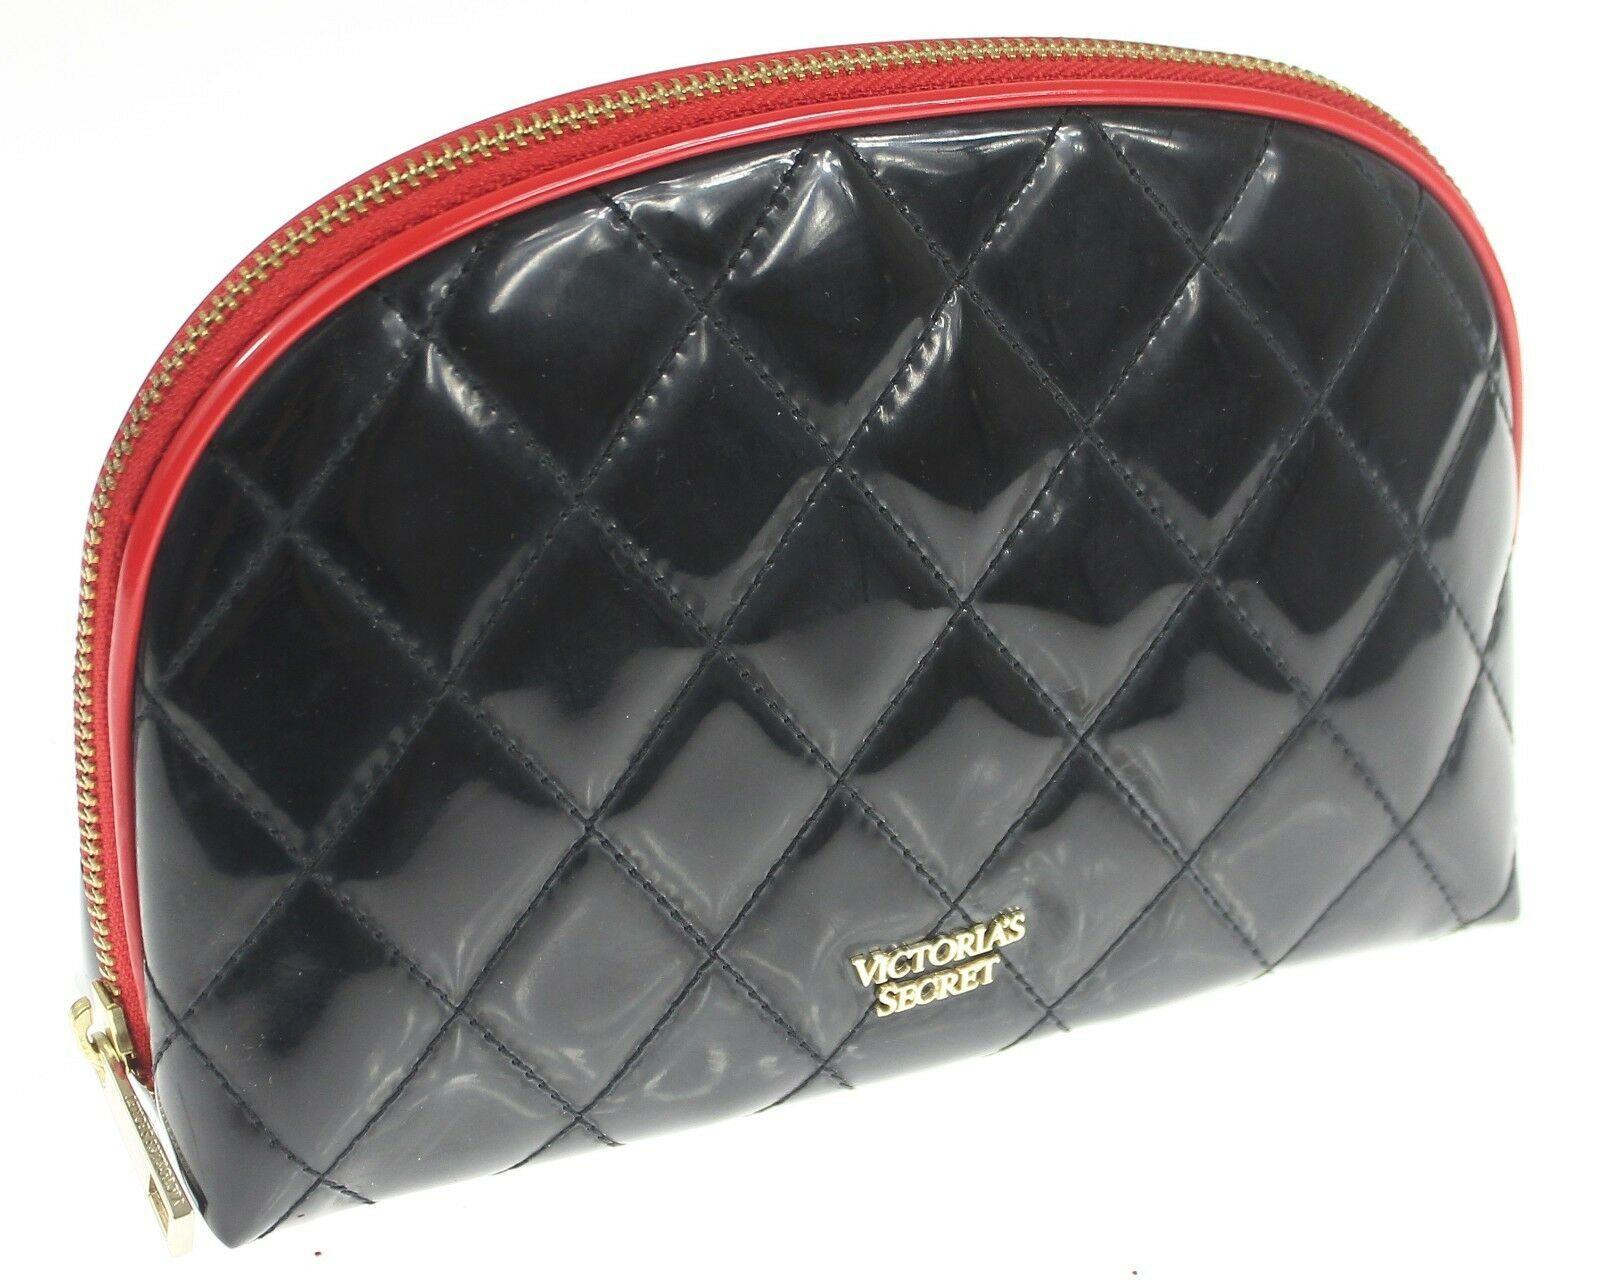 "Victorias Secret ~Cosmetic Bag~ quilted black/red trim clutch case 9""x 6""x 2.5"" - $28.96"